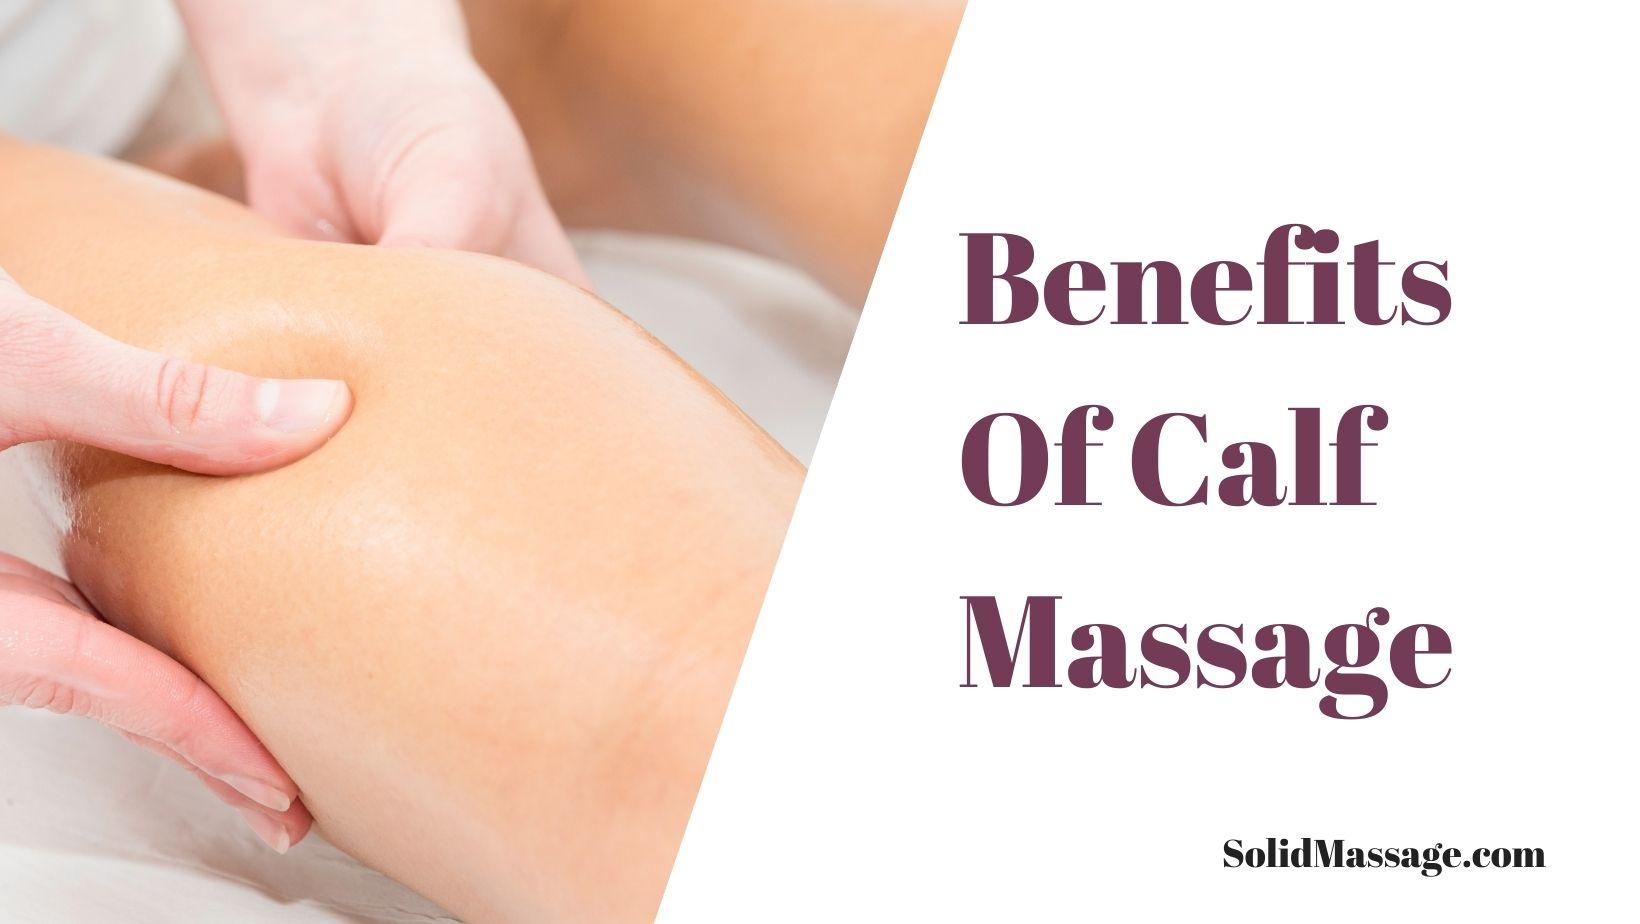 Benefits Of Calf Massage